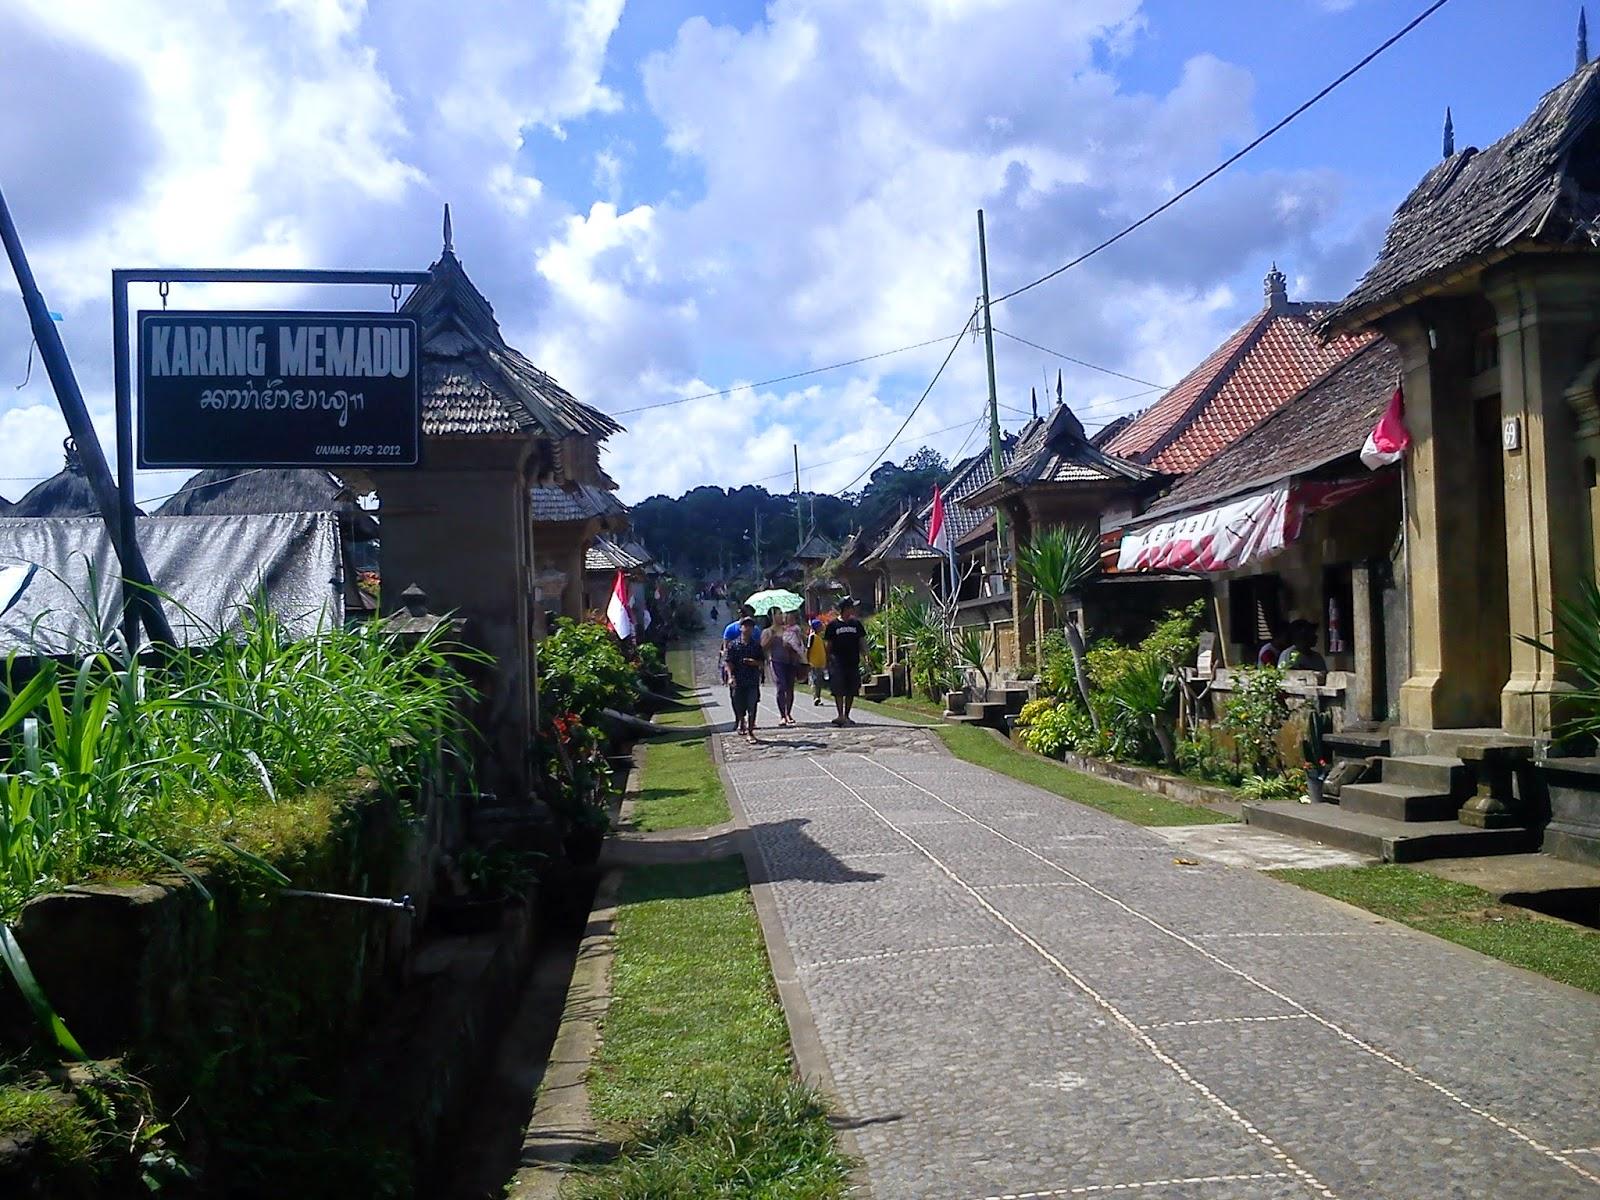 Penglipuran: Desa Paling Rapih & Bersih Di Bali